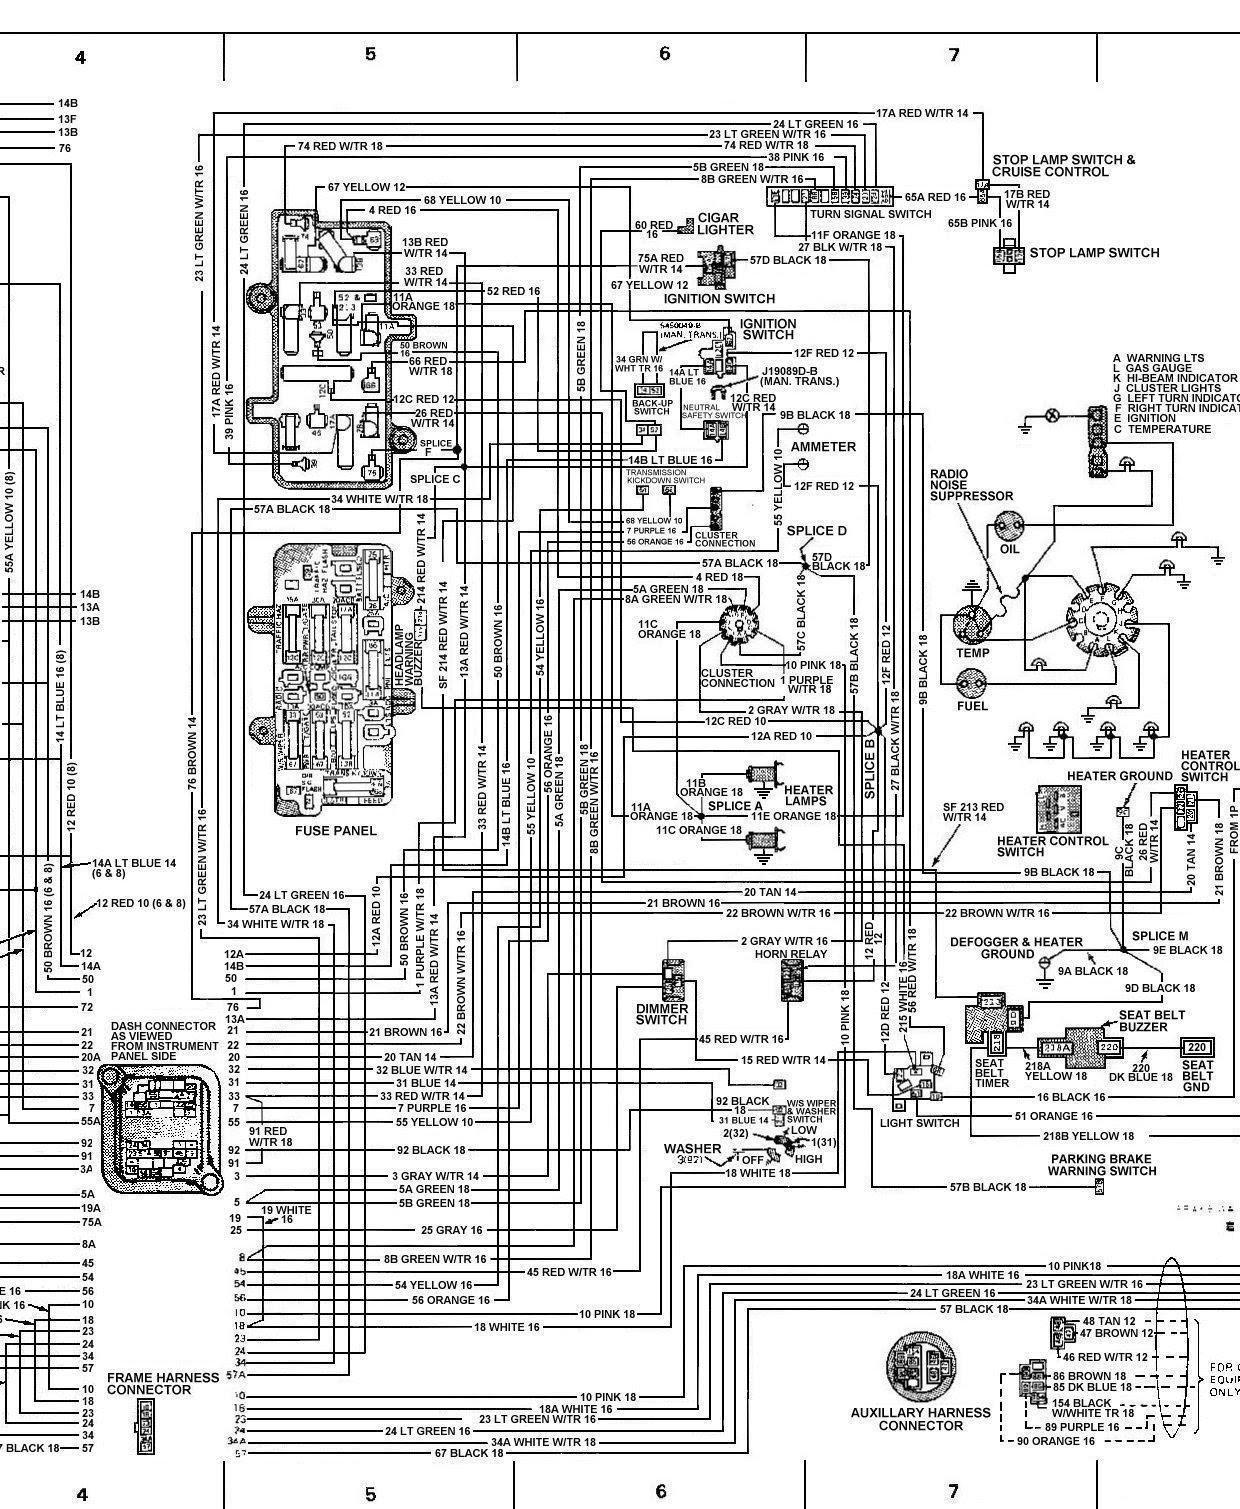 2007 Dodge Caliber Wiring Diagram - Wiring Diagrams Thumbs - 2007 Dodge Caliber Headlight Wiring Diagram